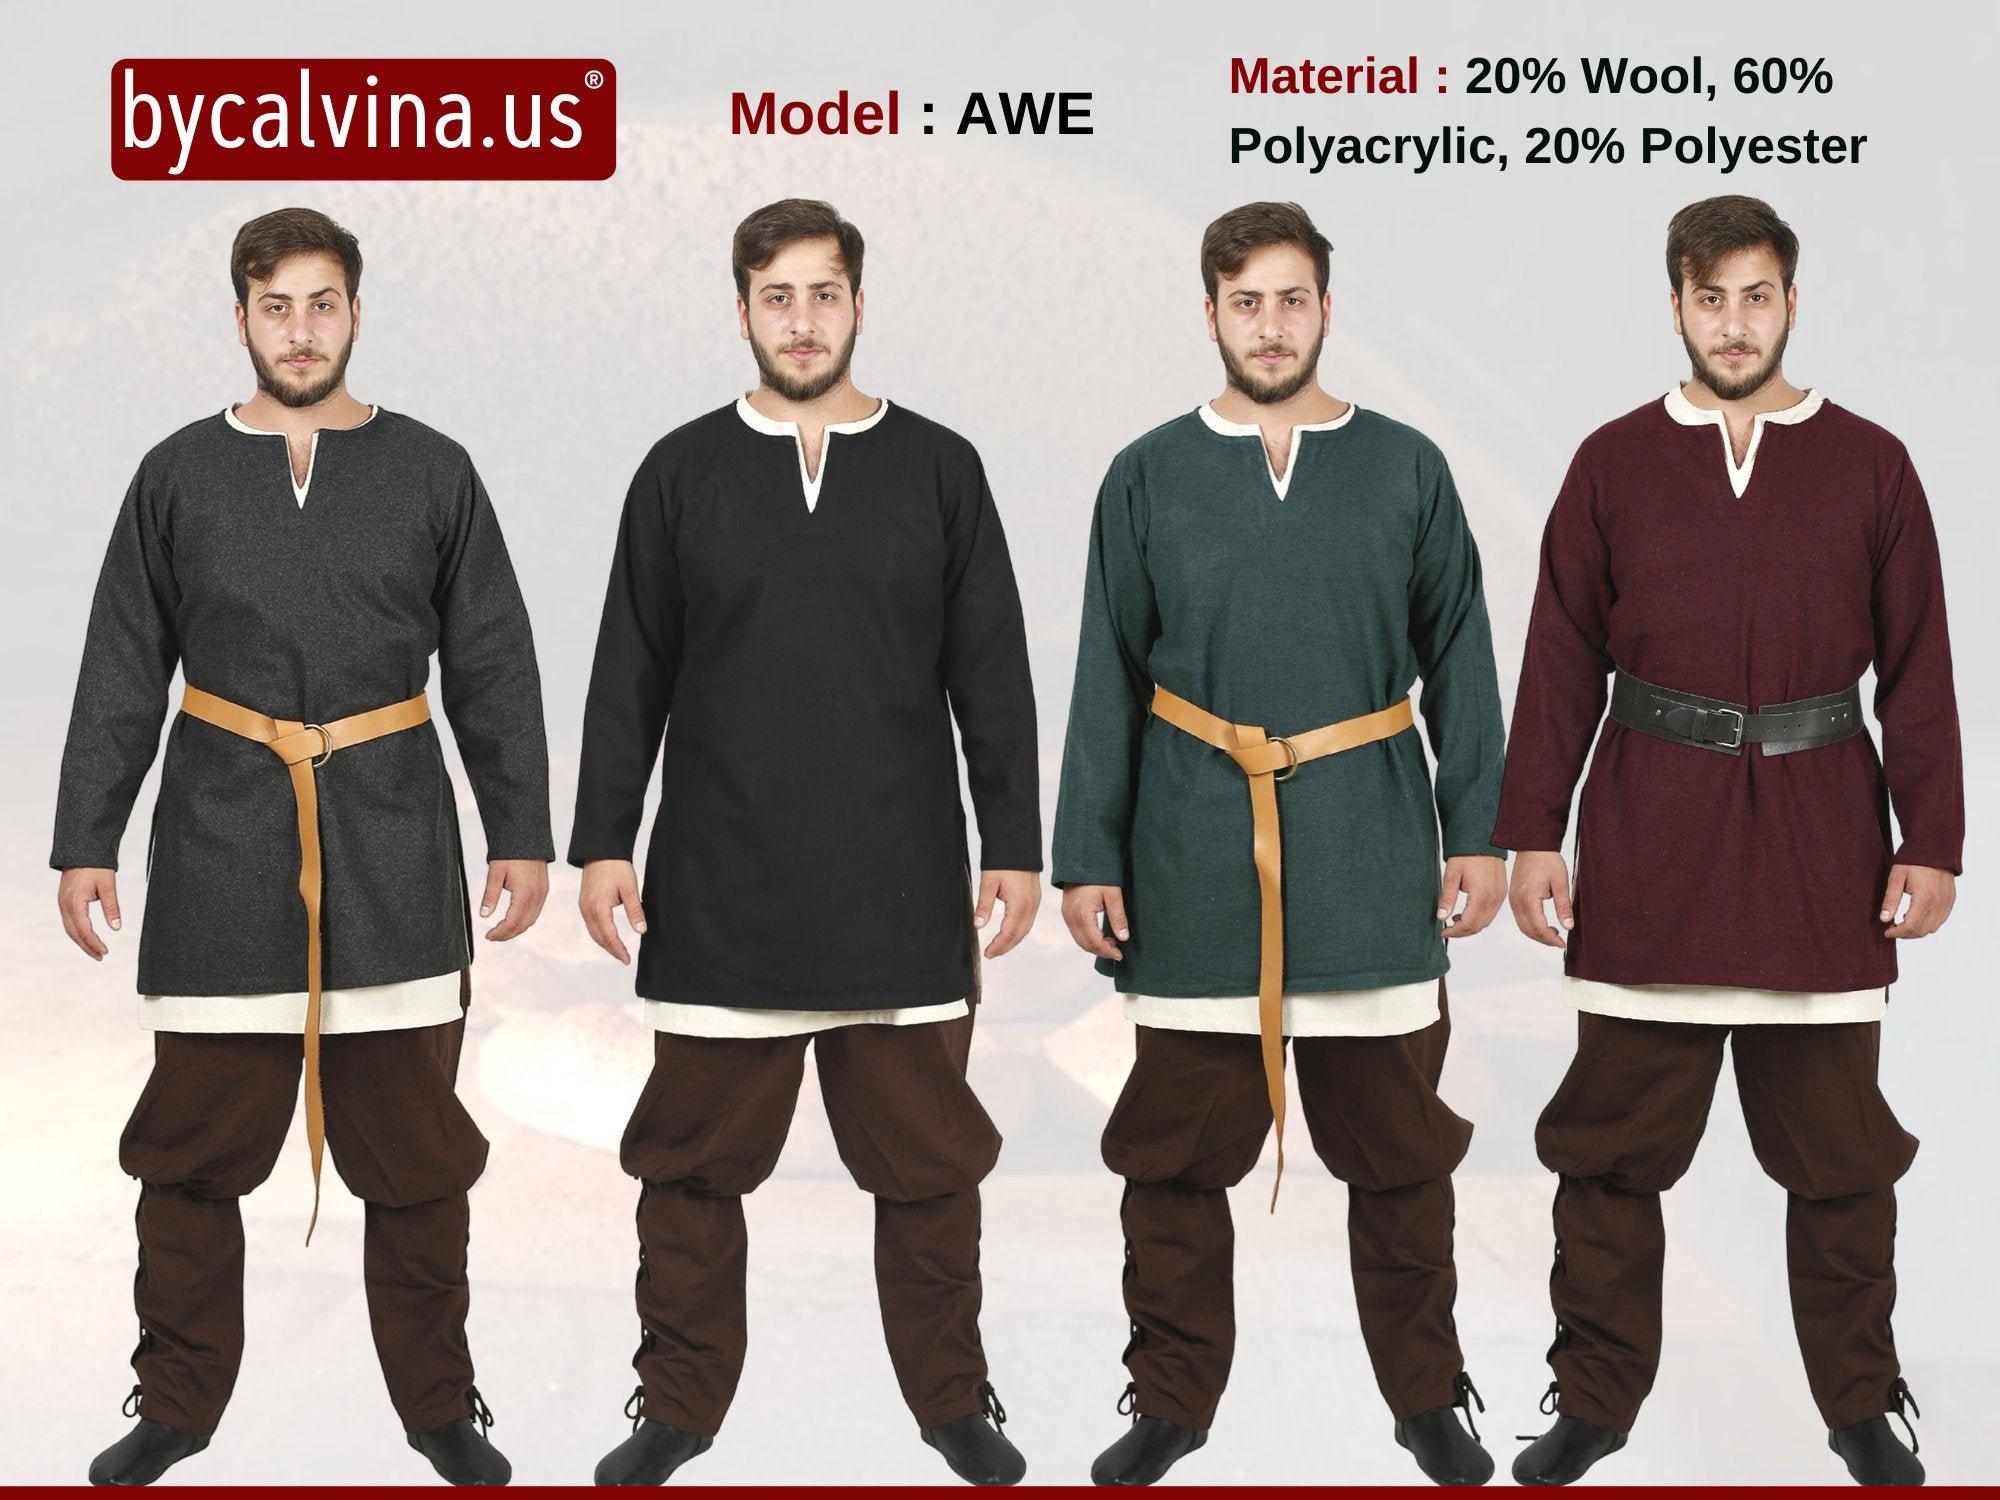 Medieval//LARP//SCA//Re enactment//Peasent MERCHANT Long Tunic ALL SIZES Inc XXXL